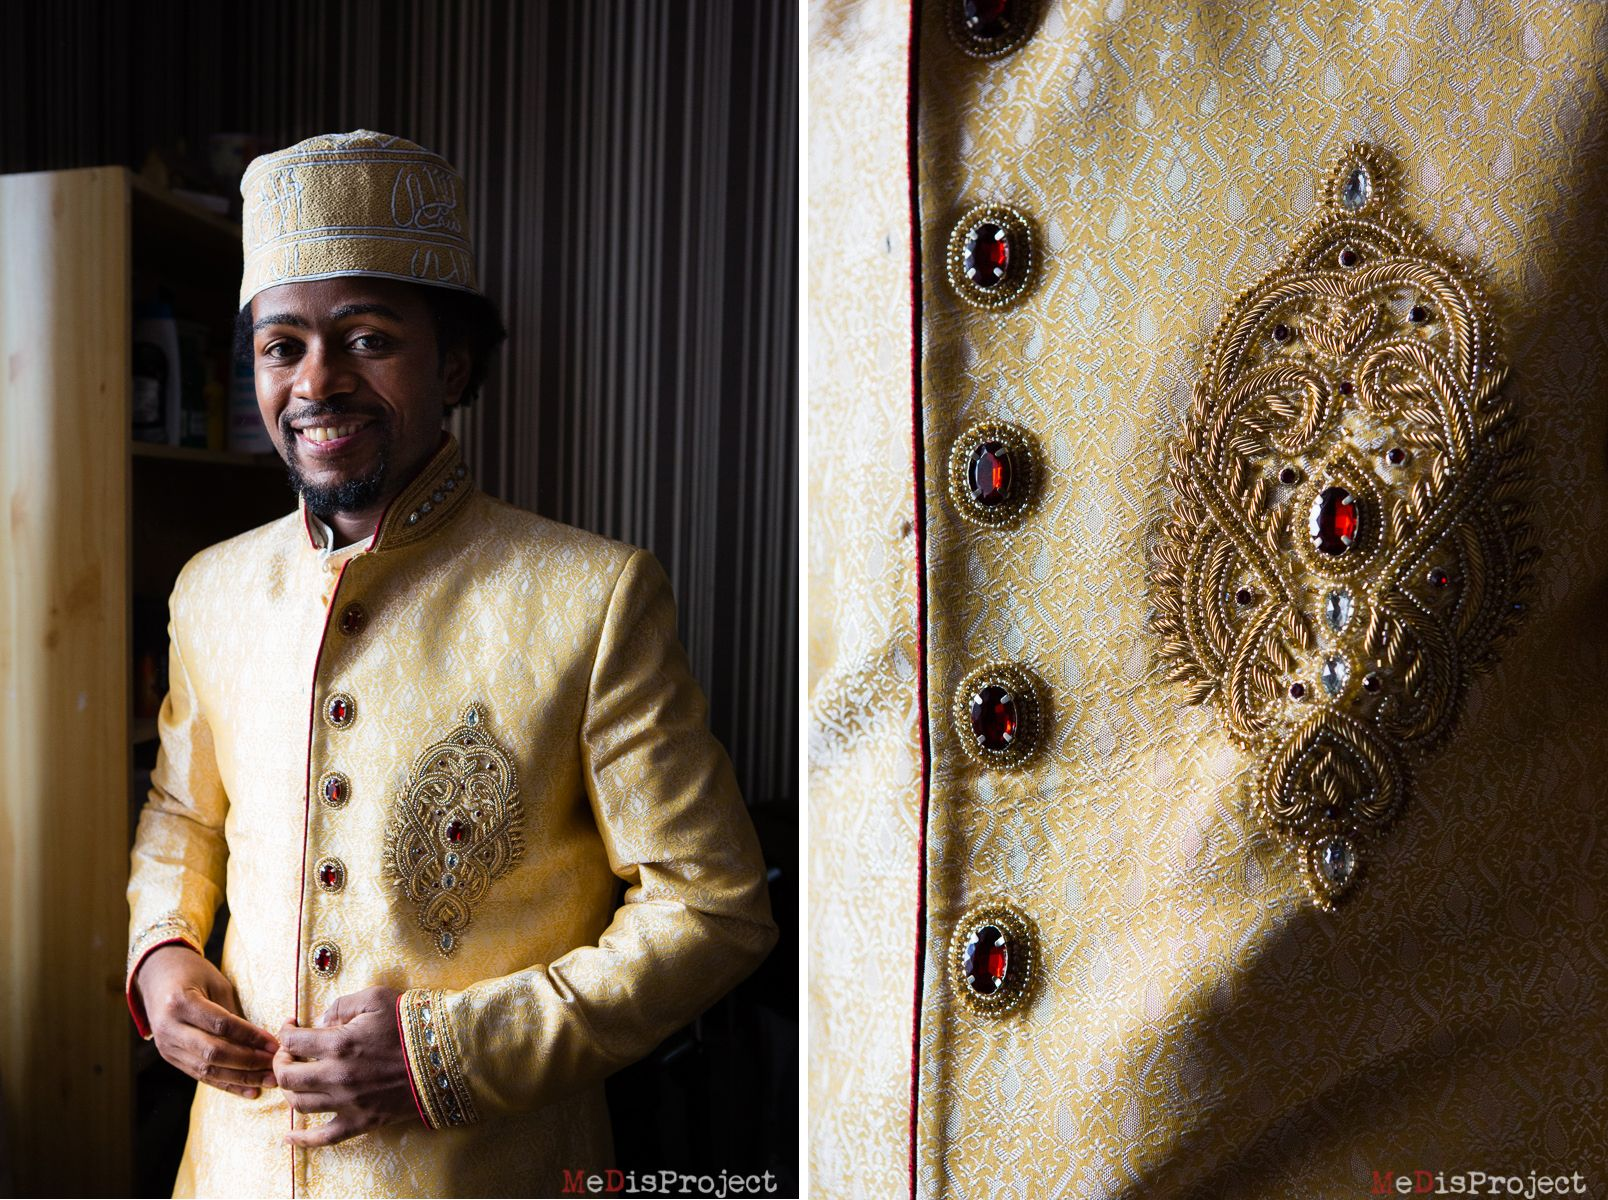 Traditional tunisian wedding dress  the groom traditional Comoros islands dress  Comoros Islands